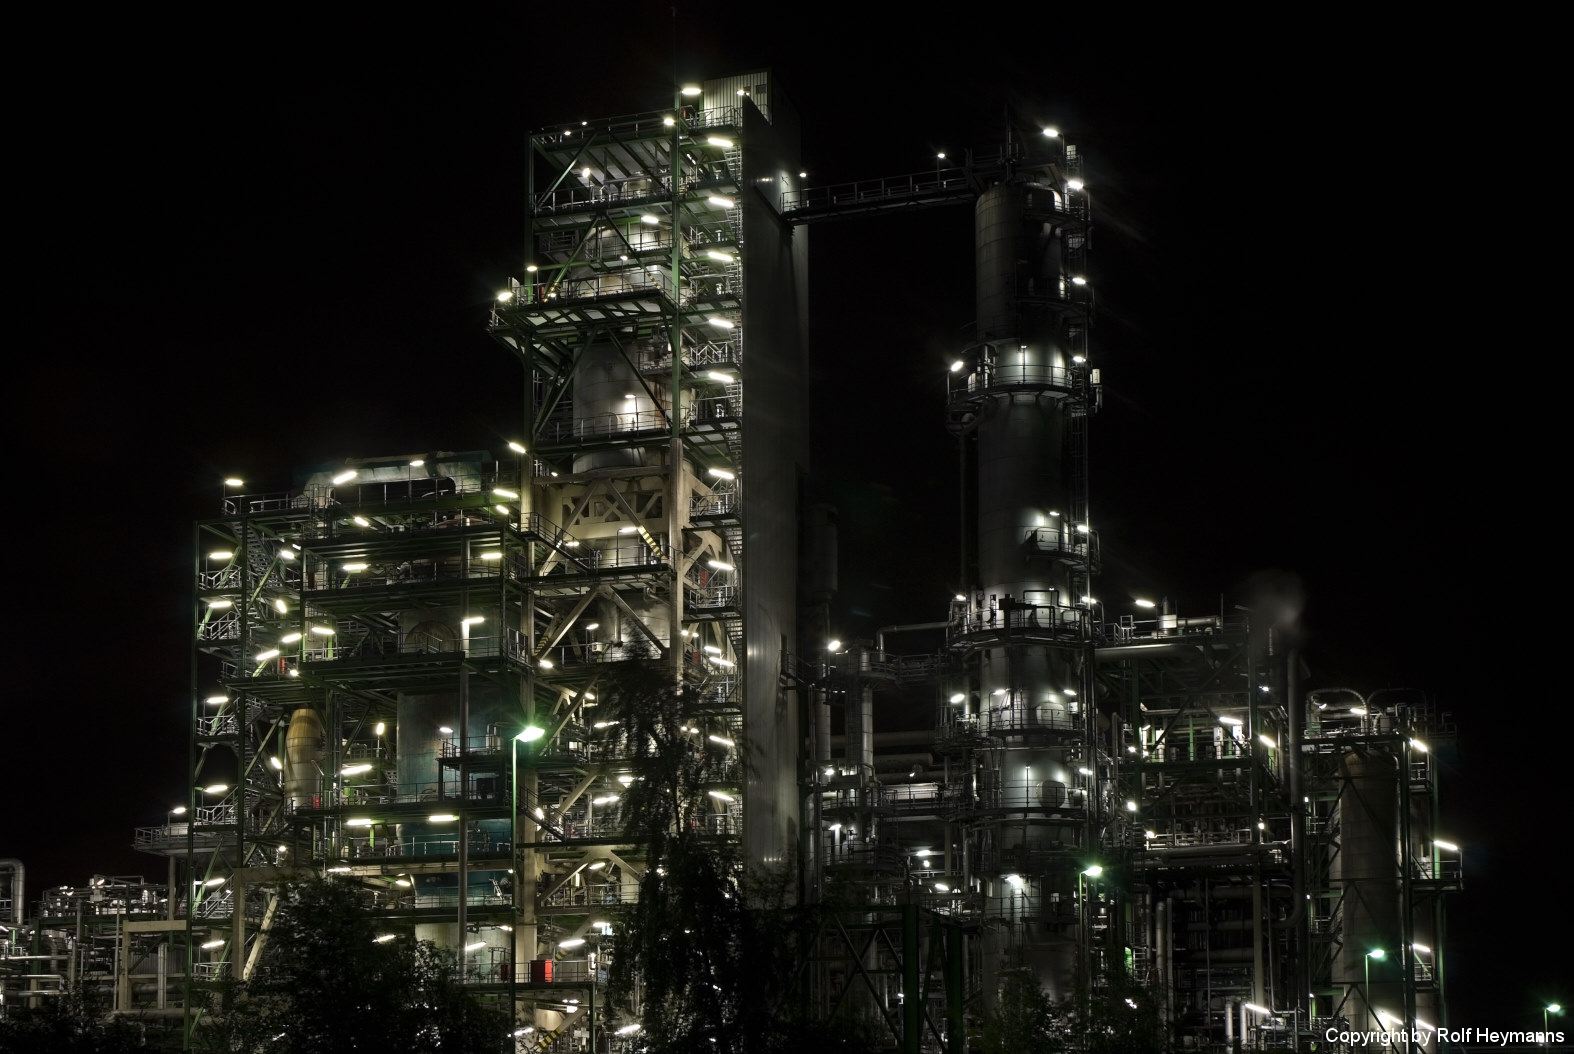 Gelsenkirchen, Veba-Öl #2